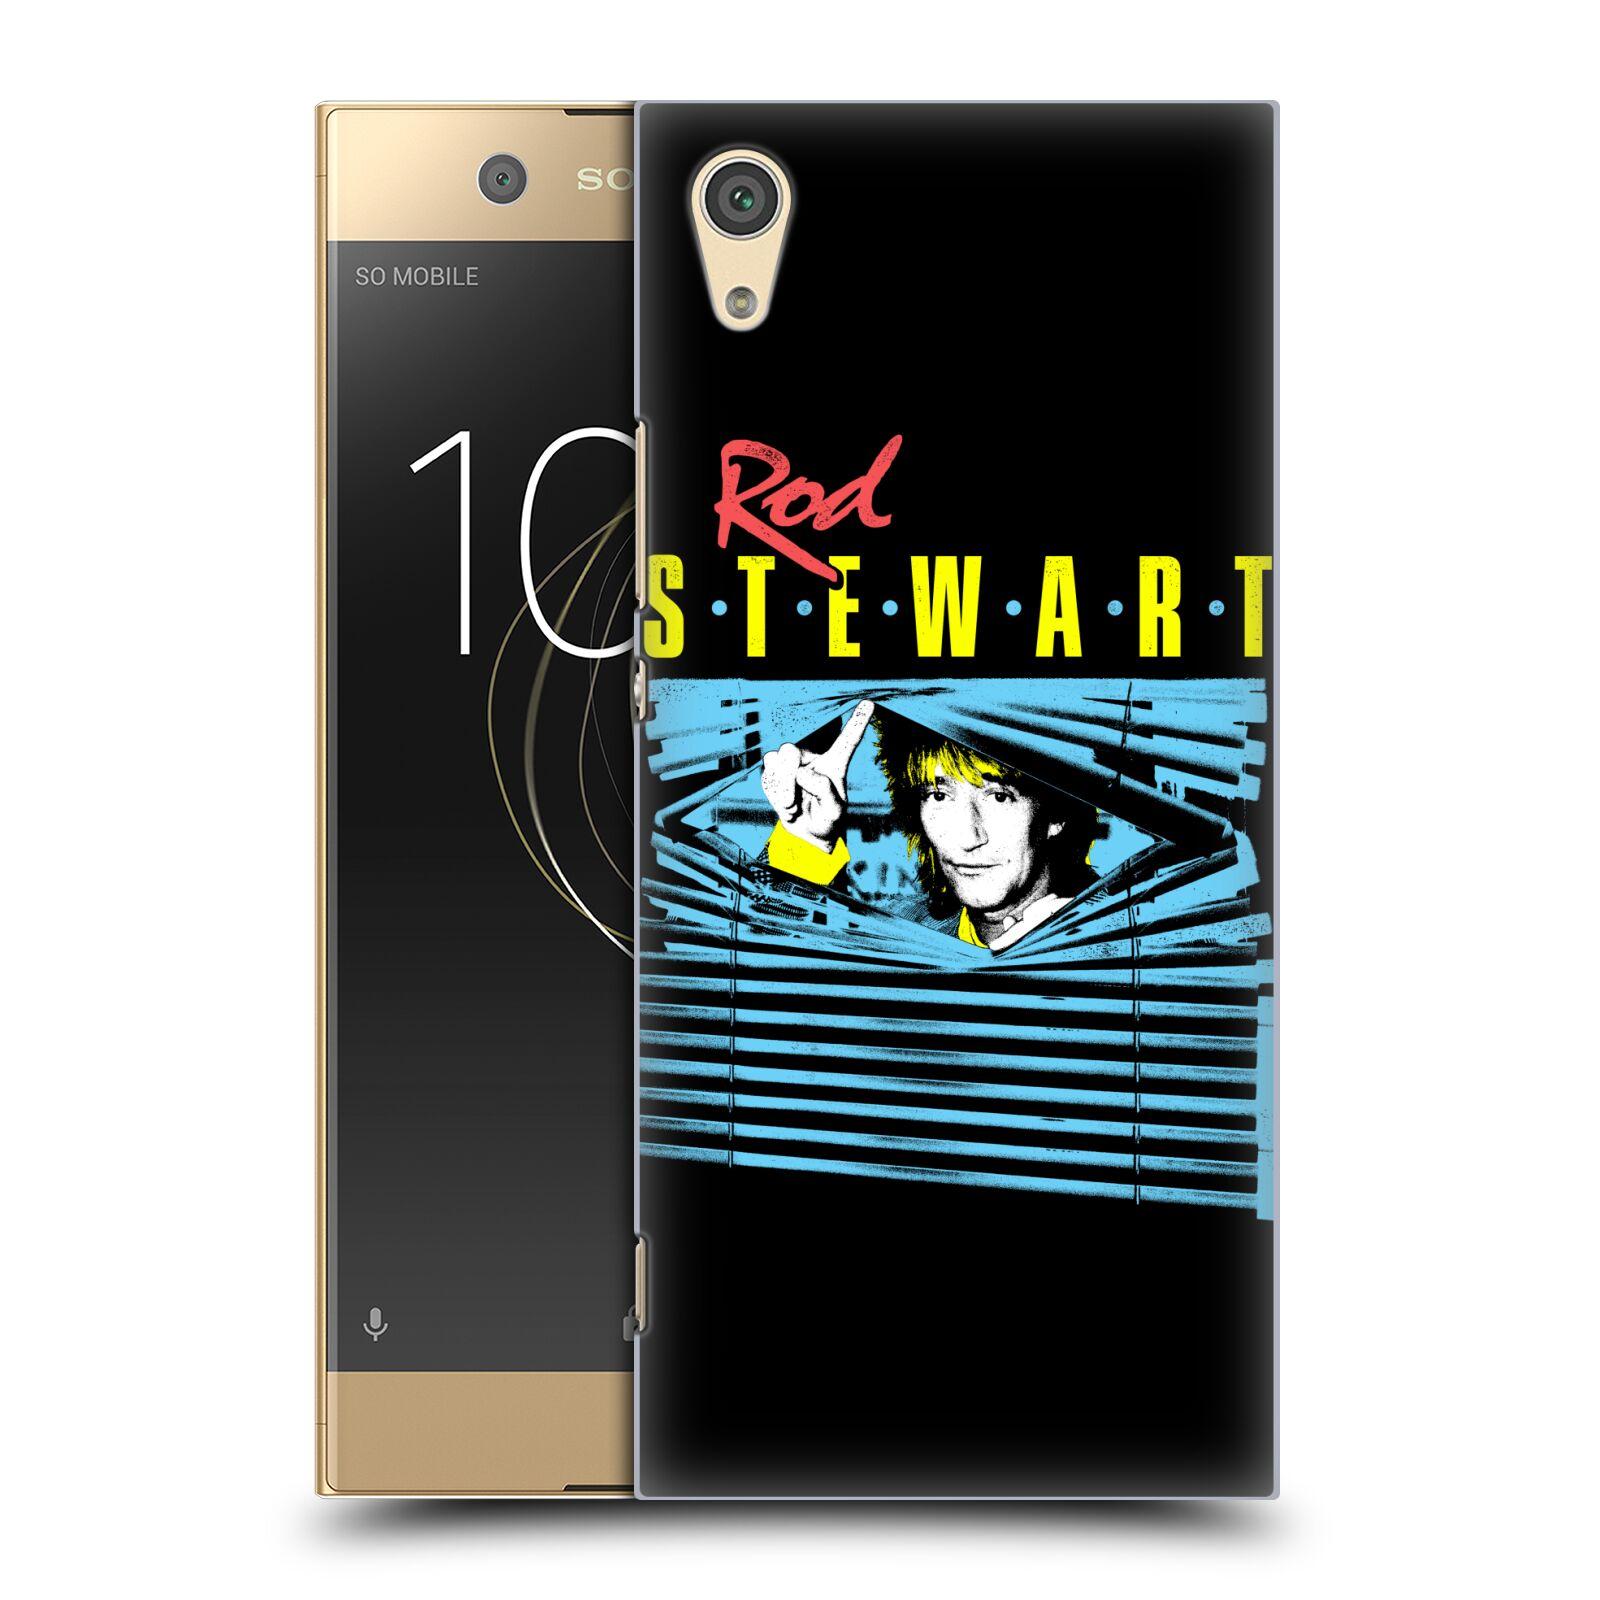 UFFICIALE-ROD-STEWART-ART-HARD-BACK-CASE-per-SONY-telefoni-1